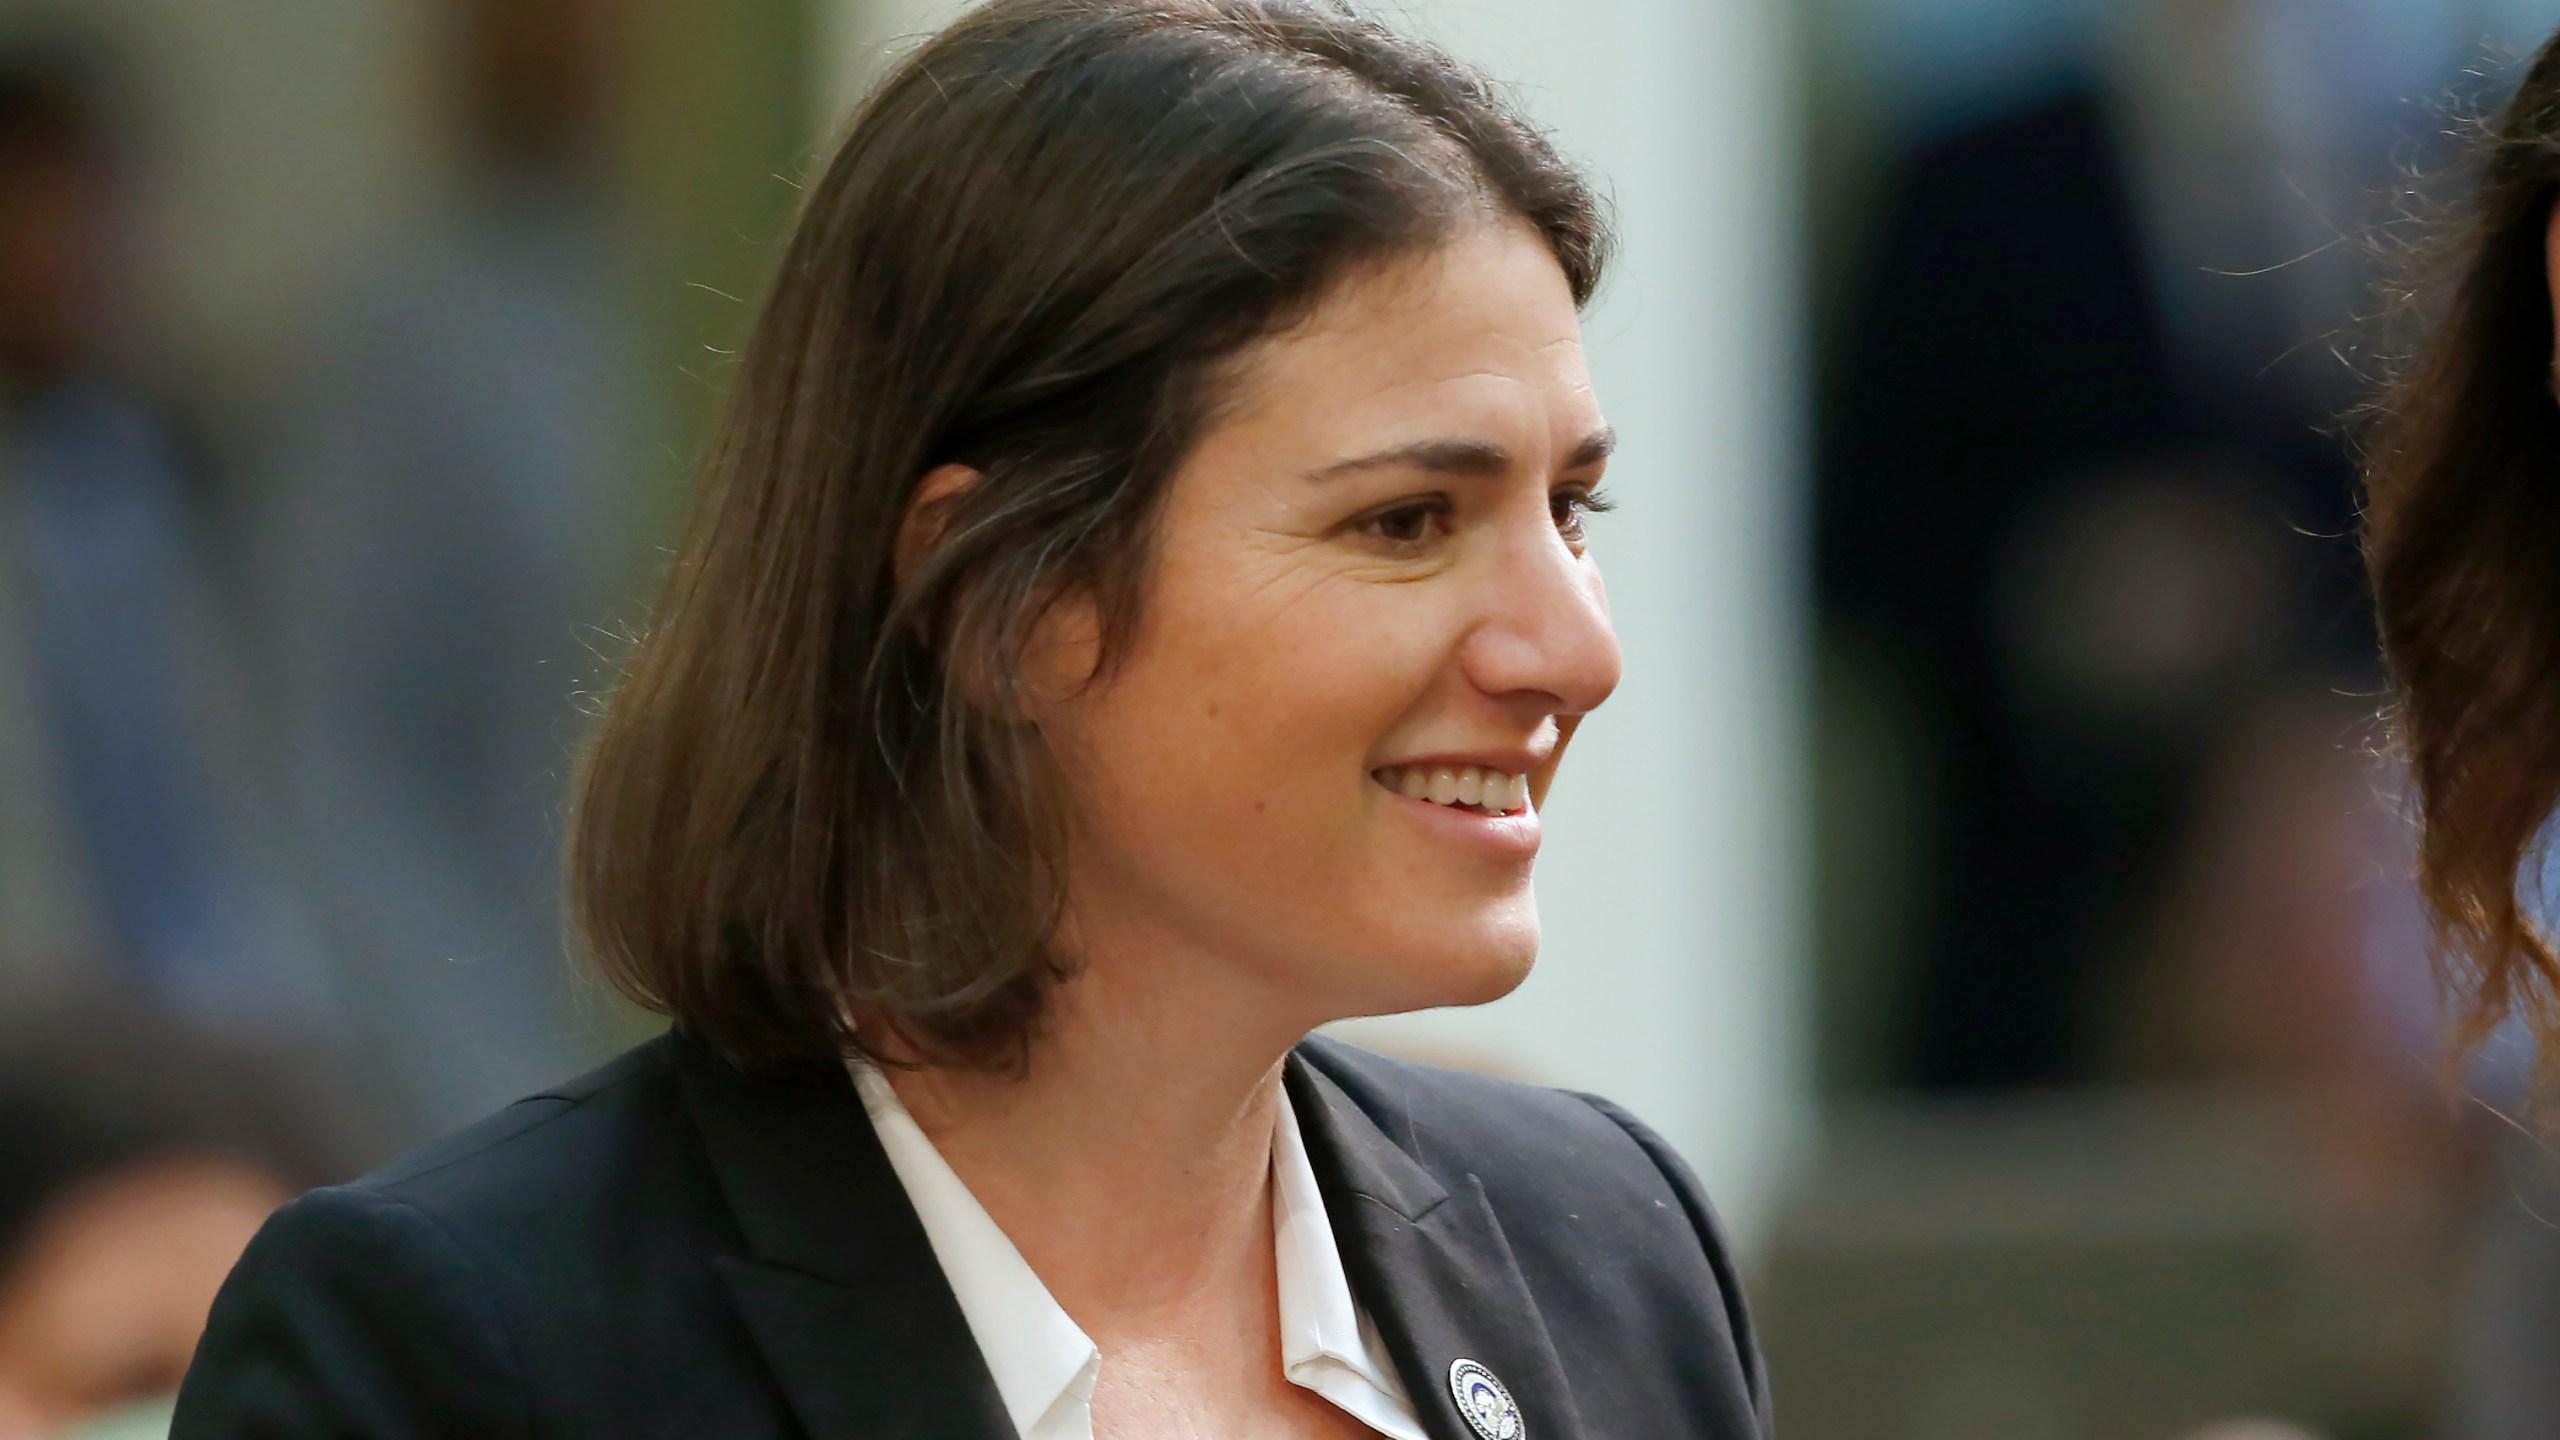 Rebecca Bauer-Kahan